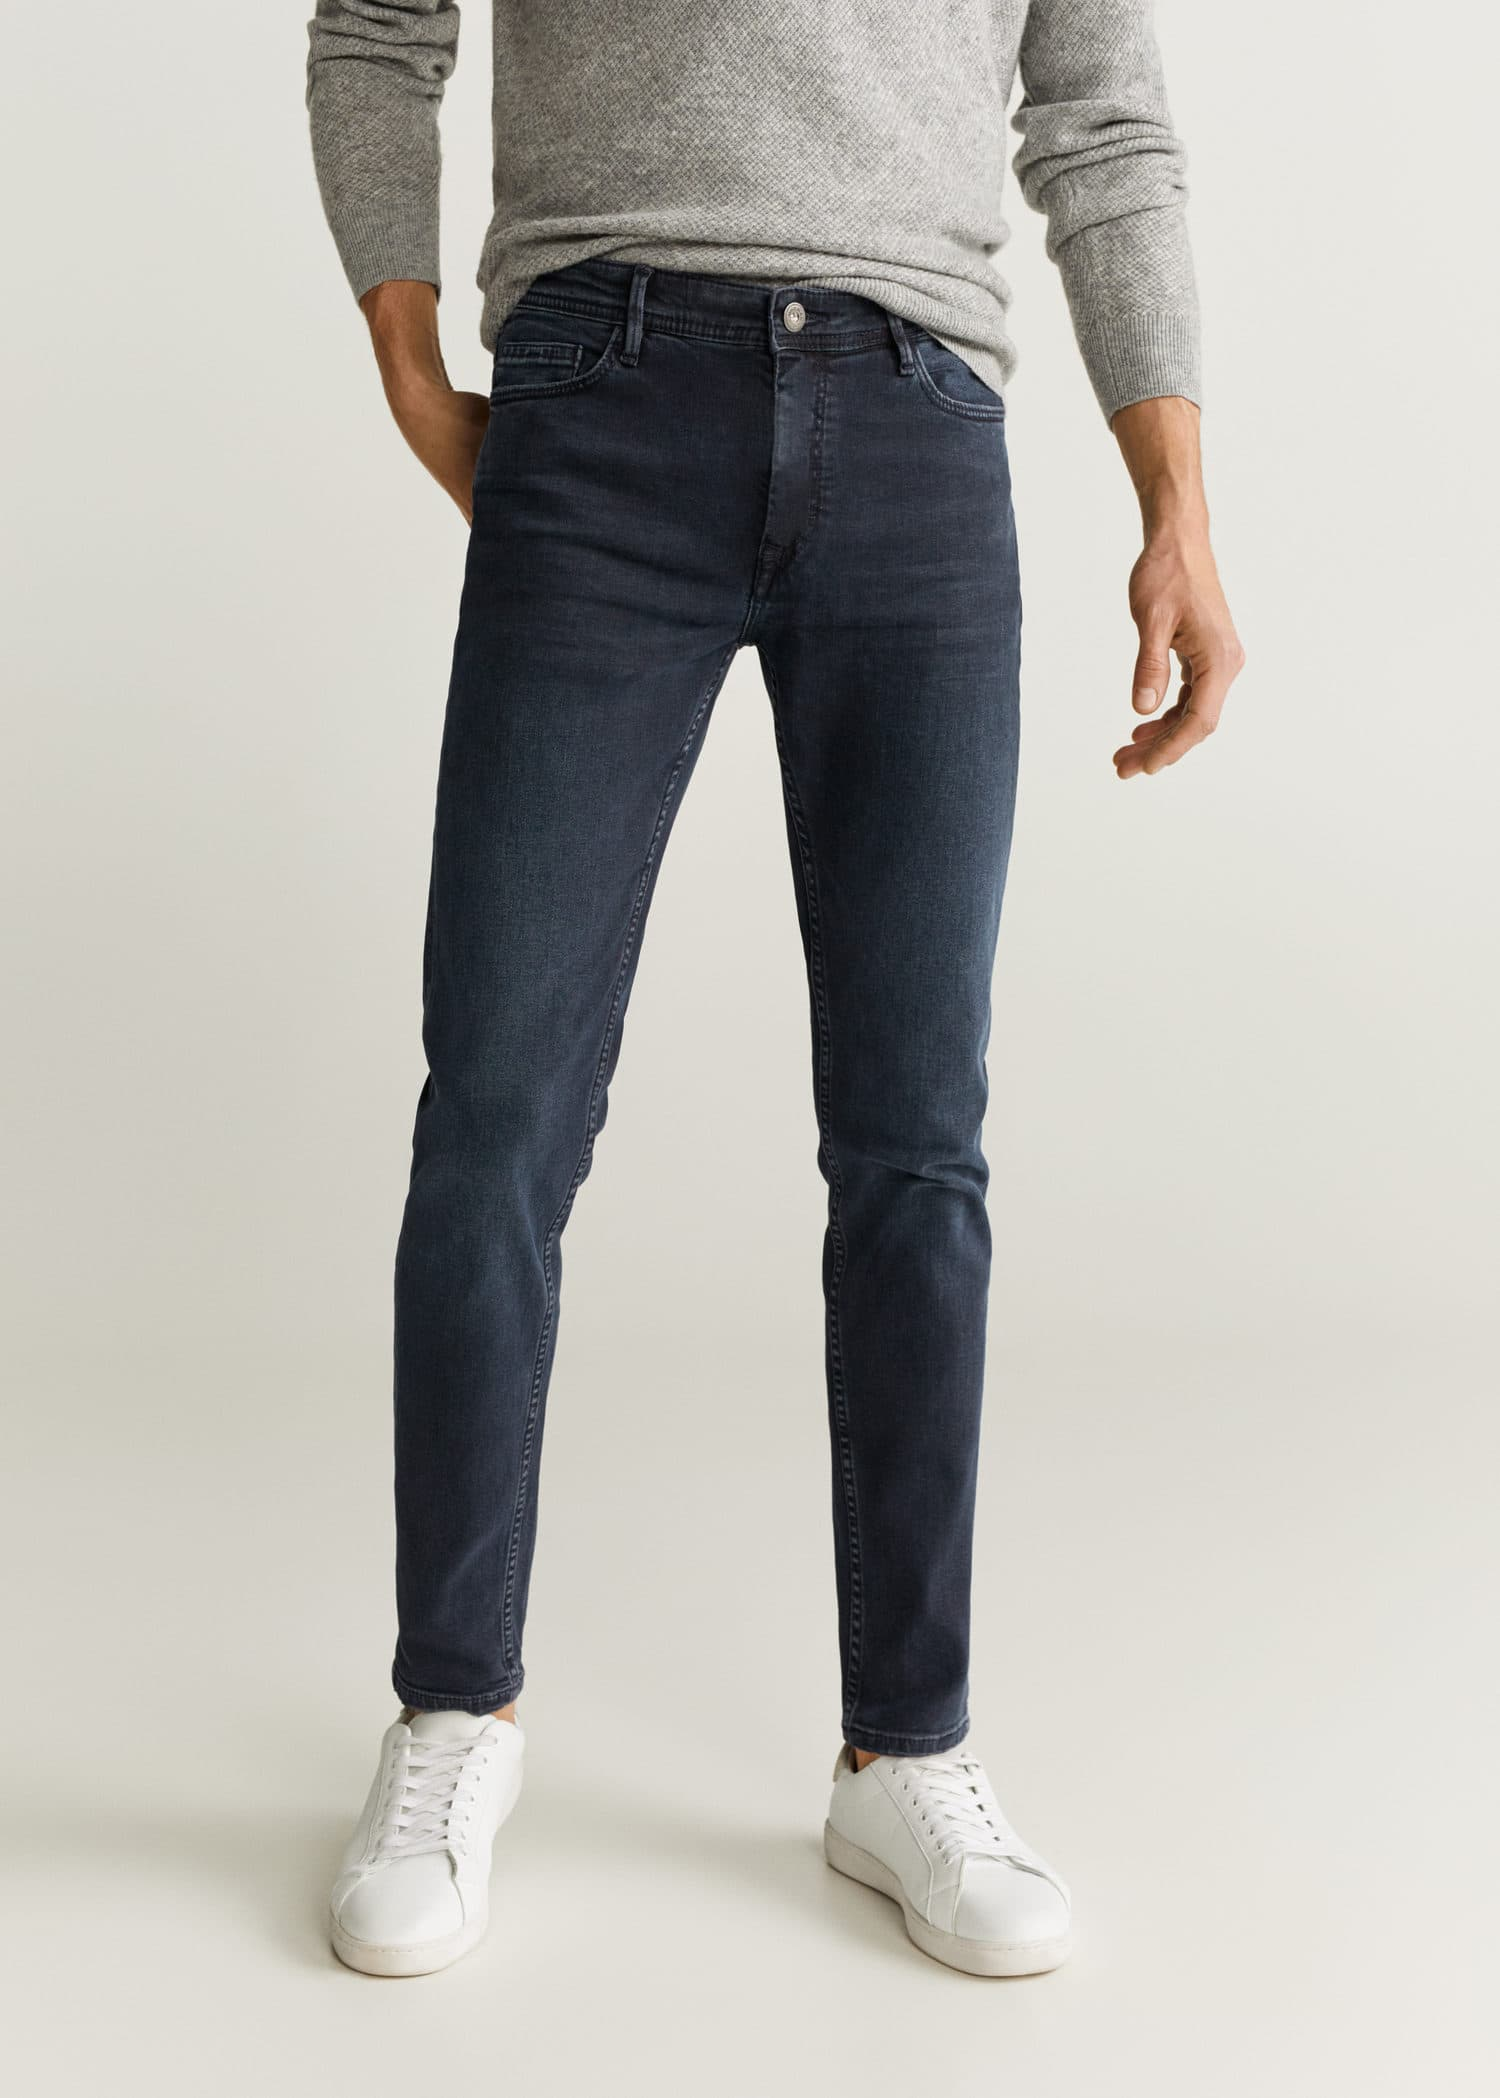 Jeans tim slim fit com lavagem escura gasta Homem   Mango